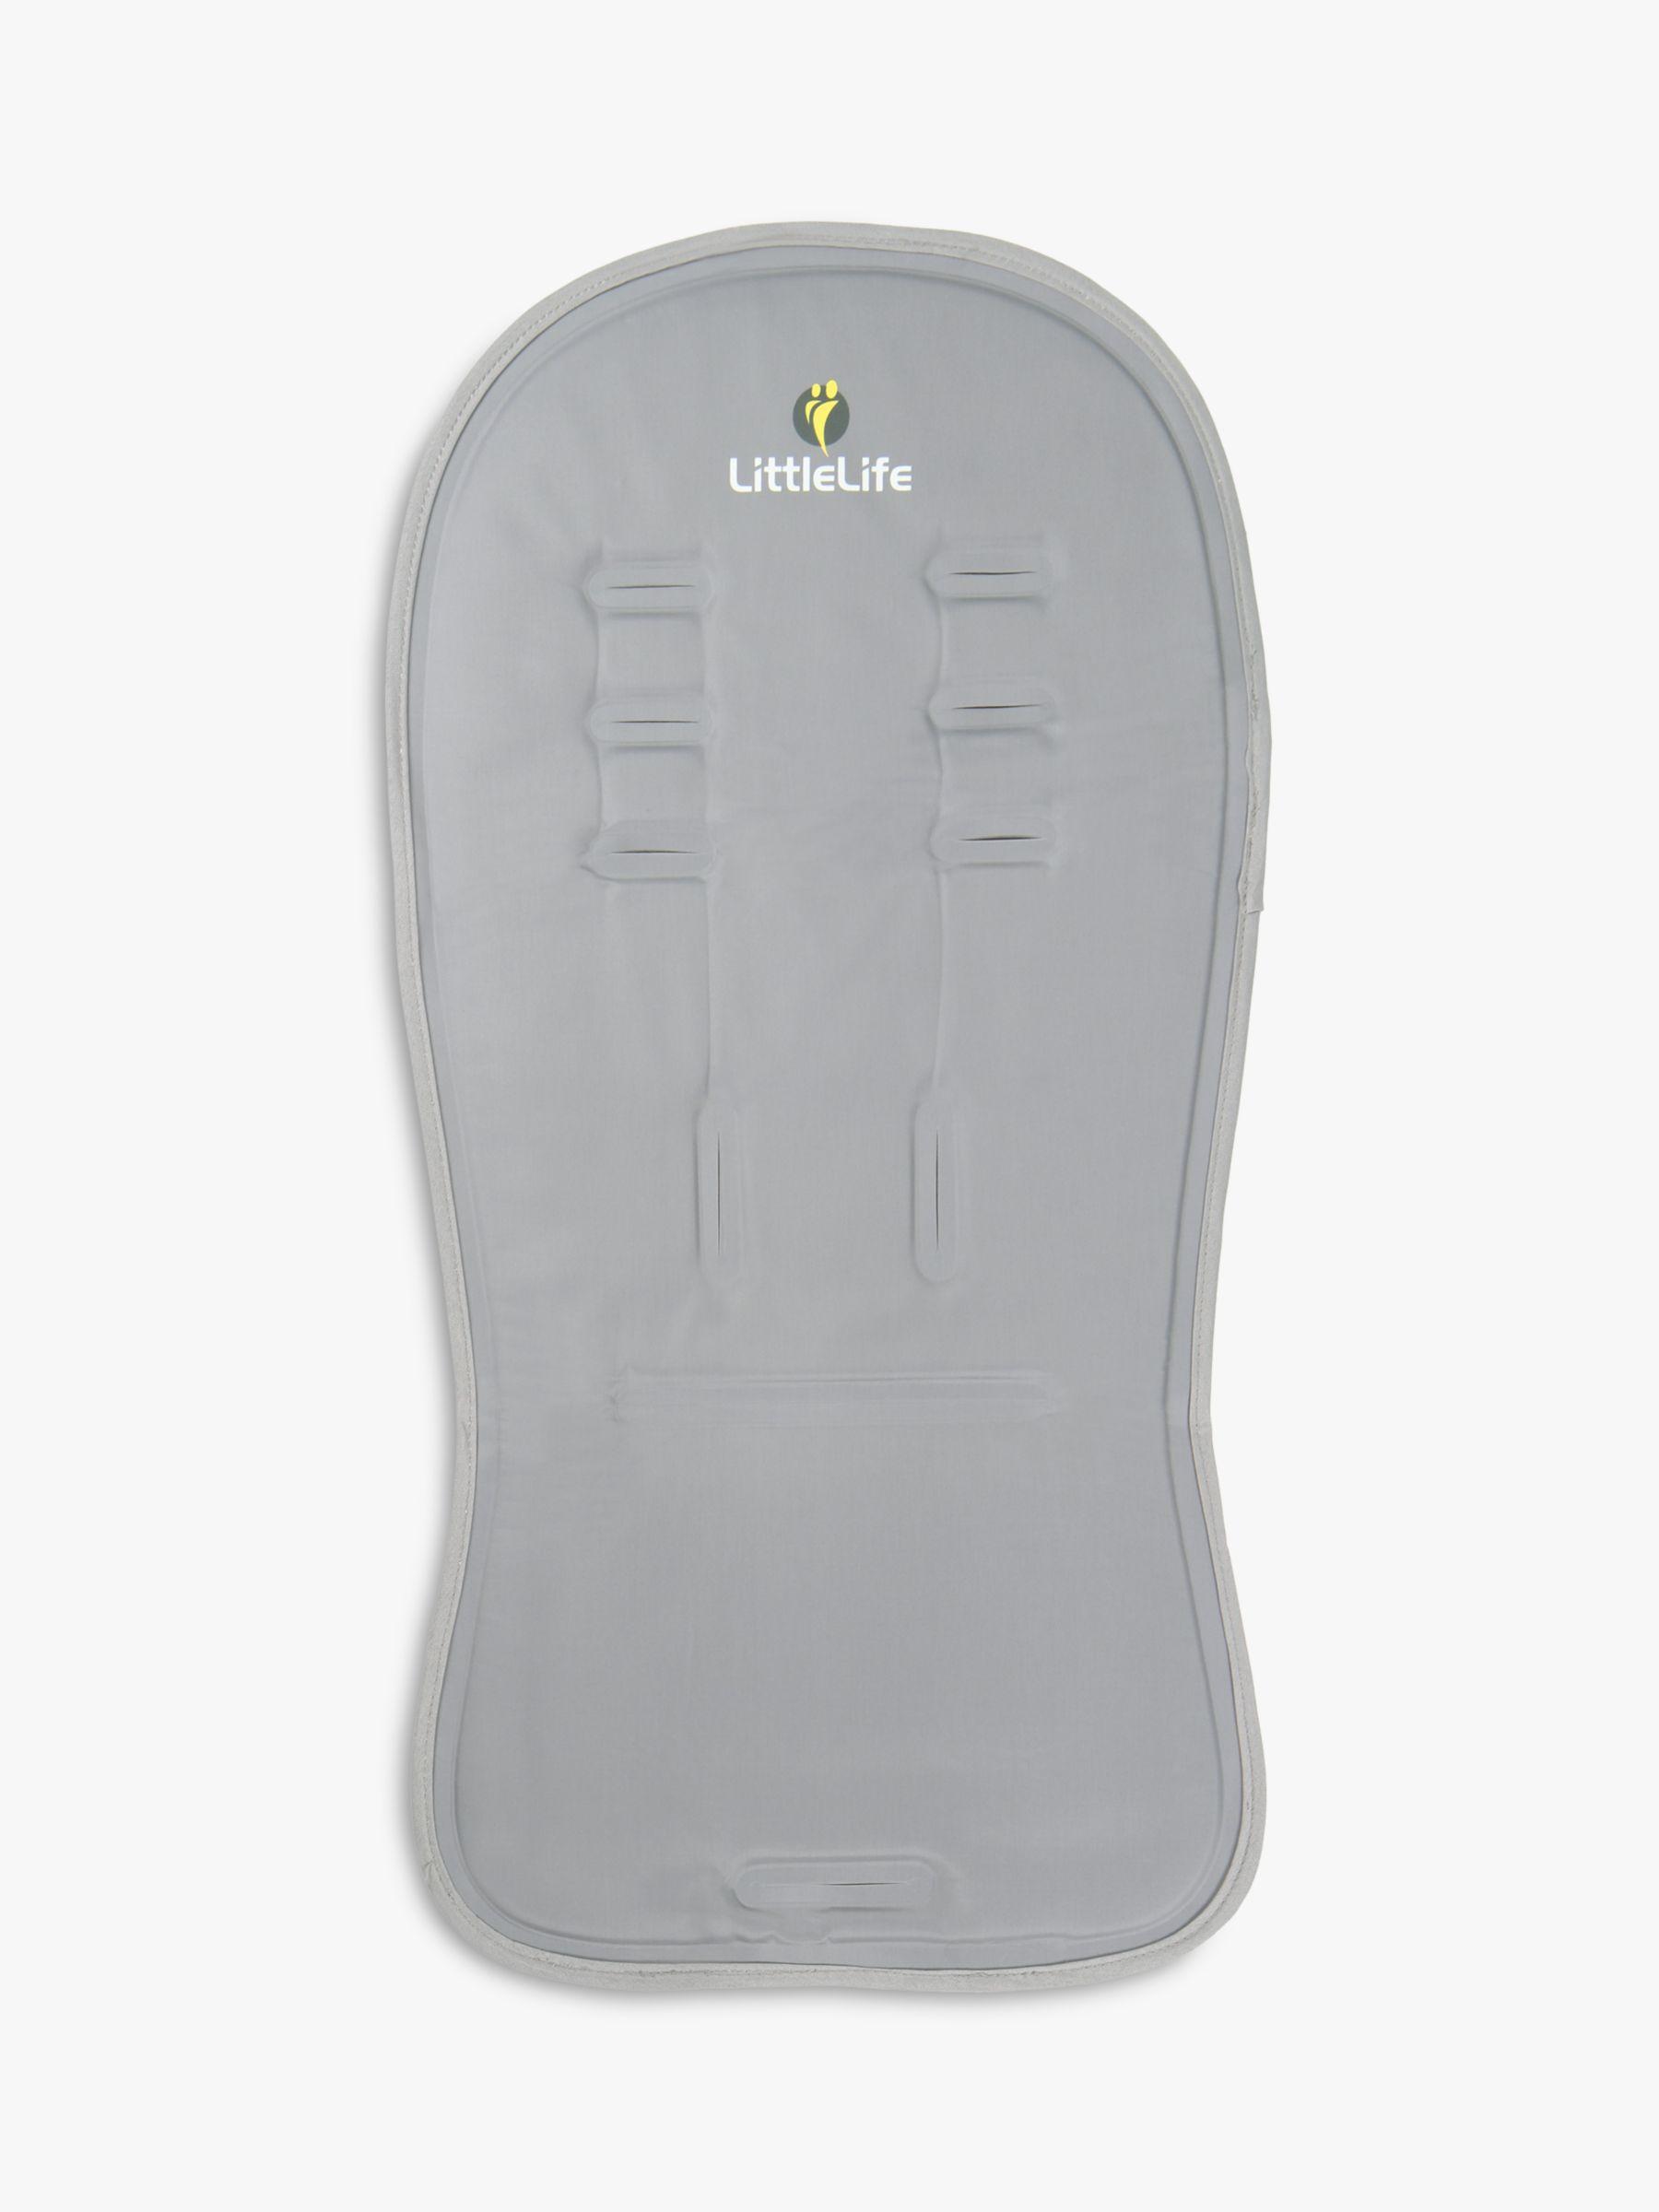 Littlelife LittleLife Pushchair Cooling Pad